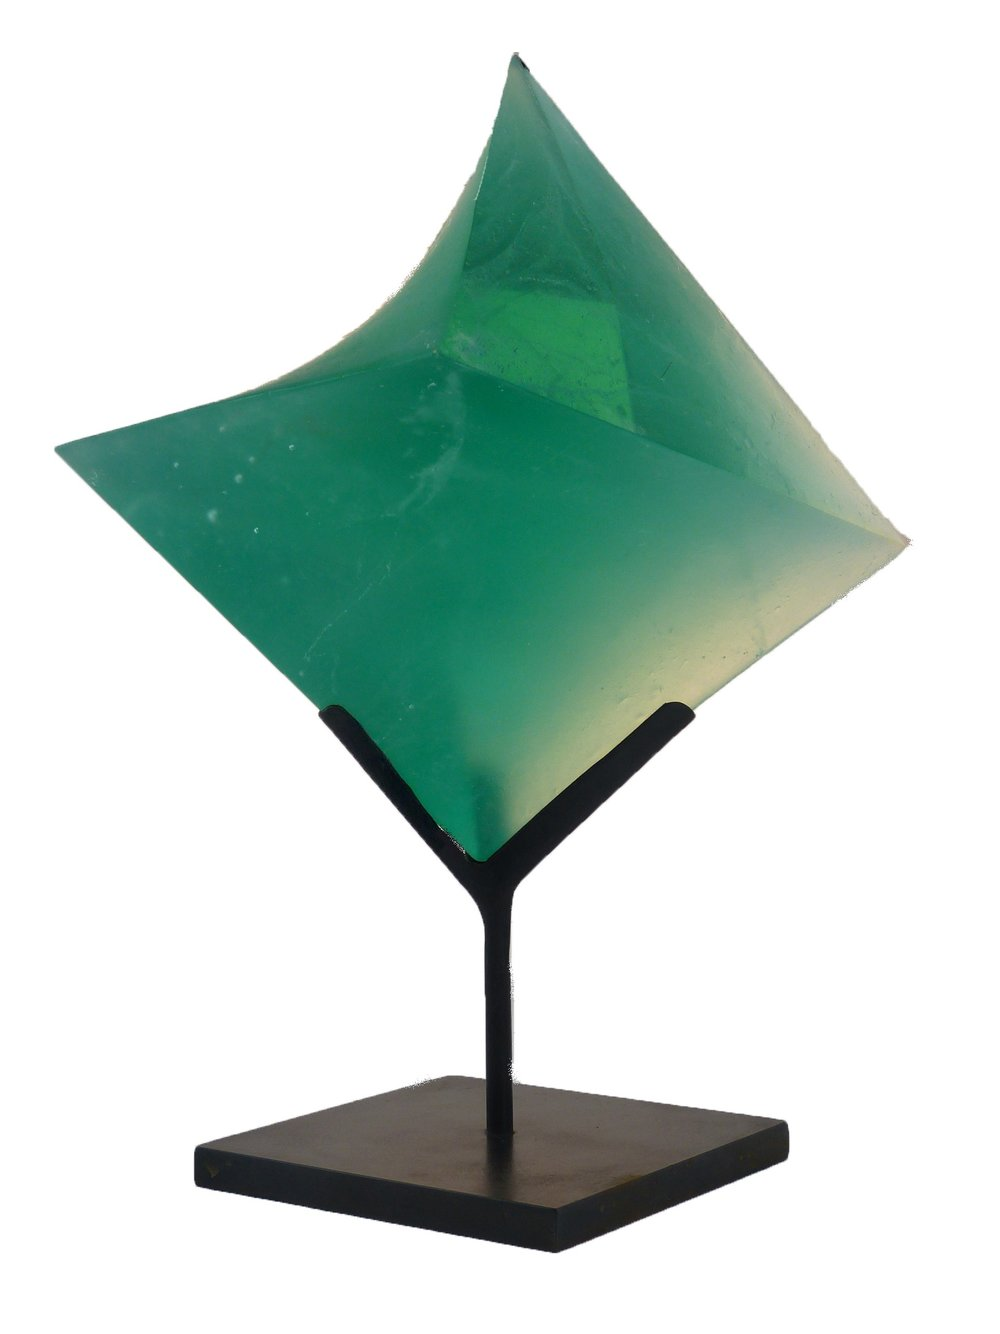 Haye+Willi+green+twisted+triangle.jpg